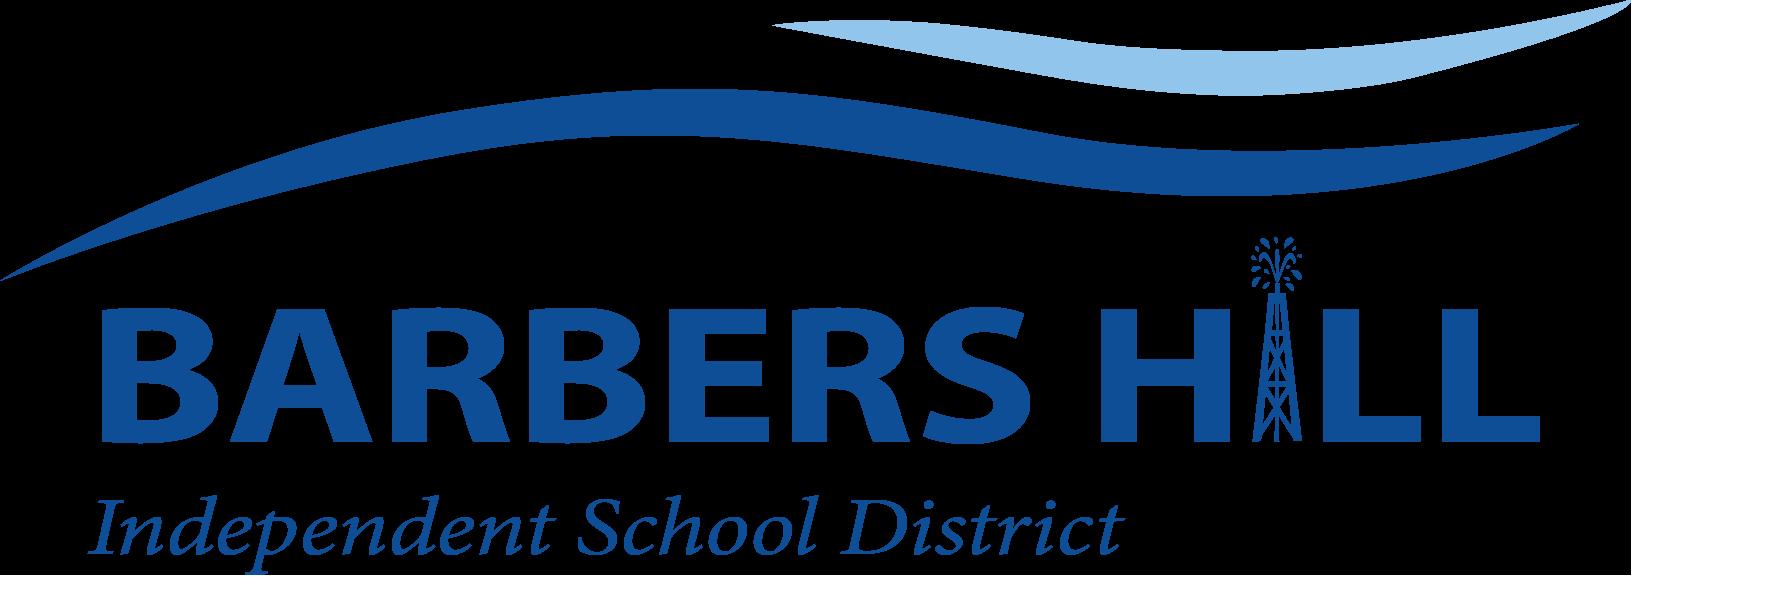 Barbers Hill ISD logo